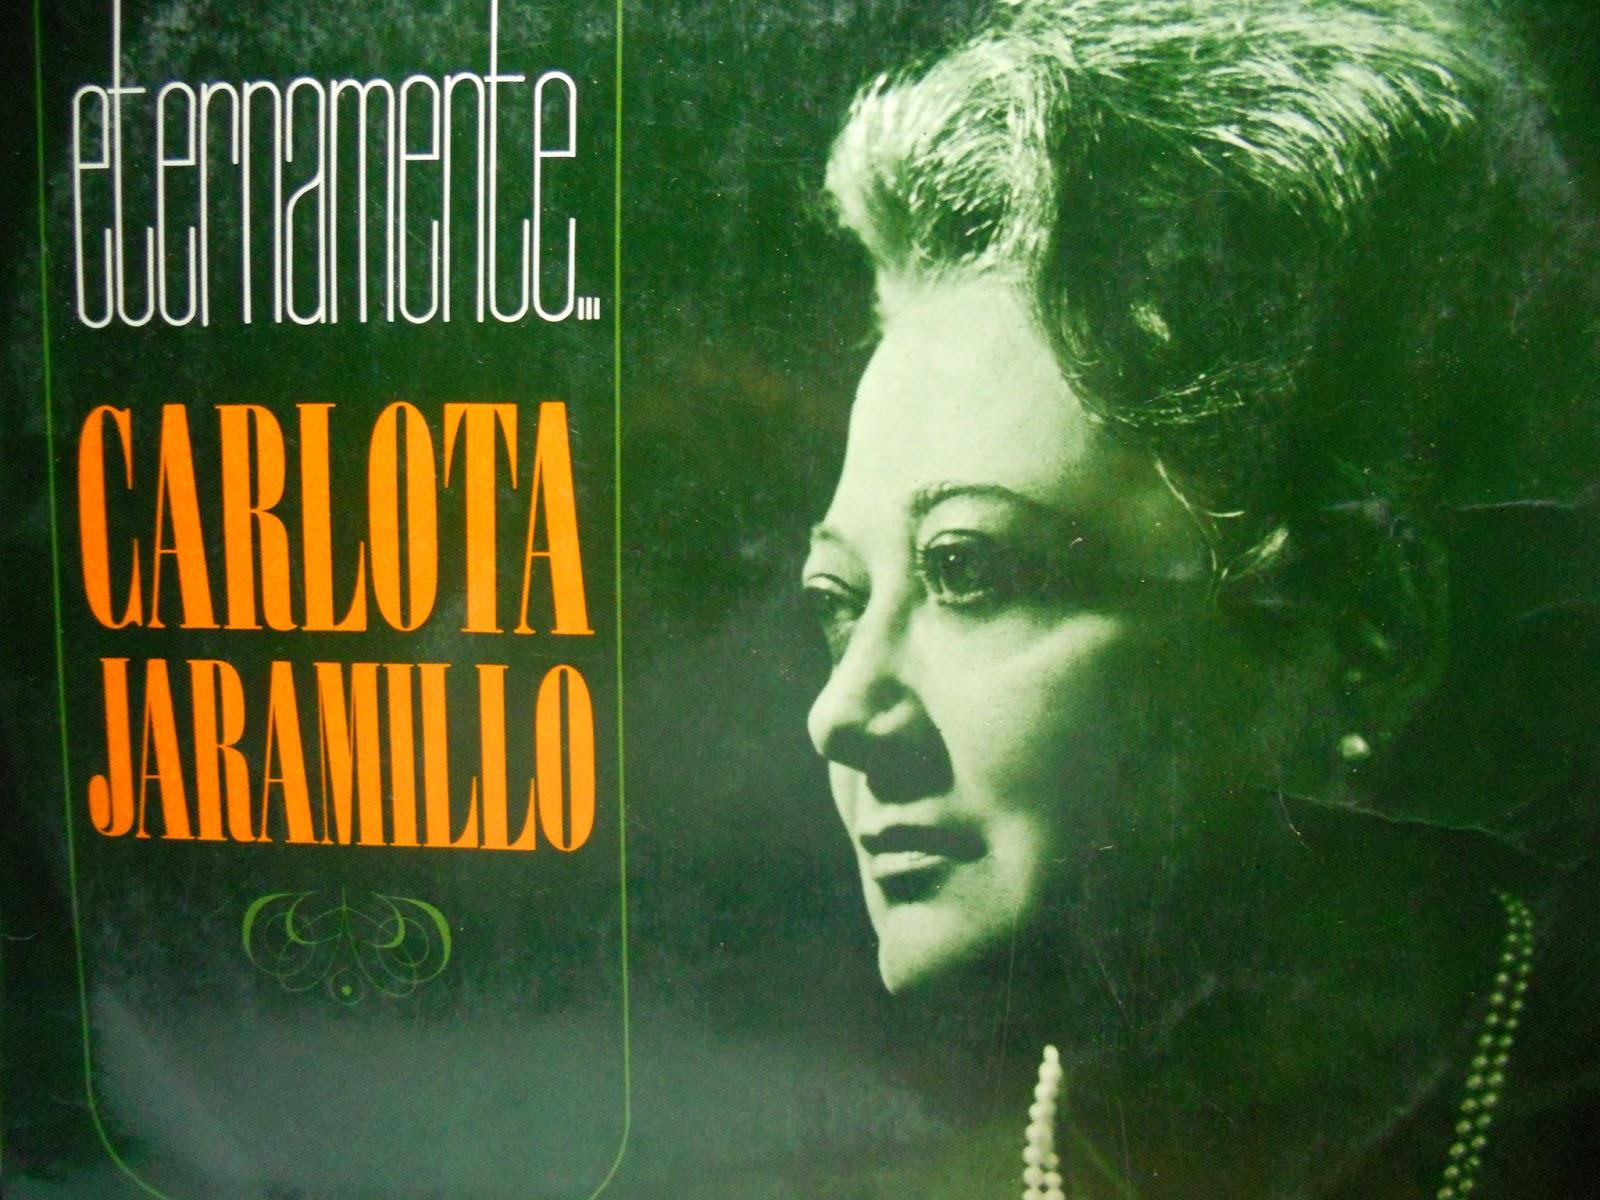 Especial de Carlota Jaramillo